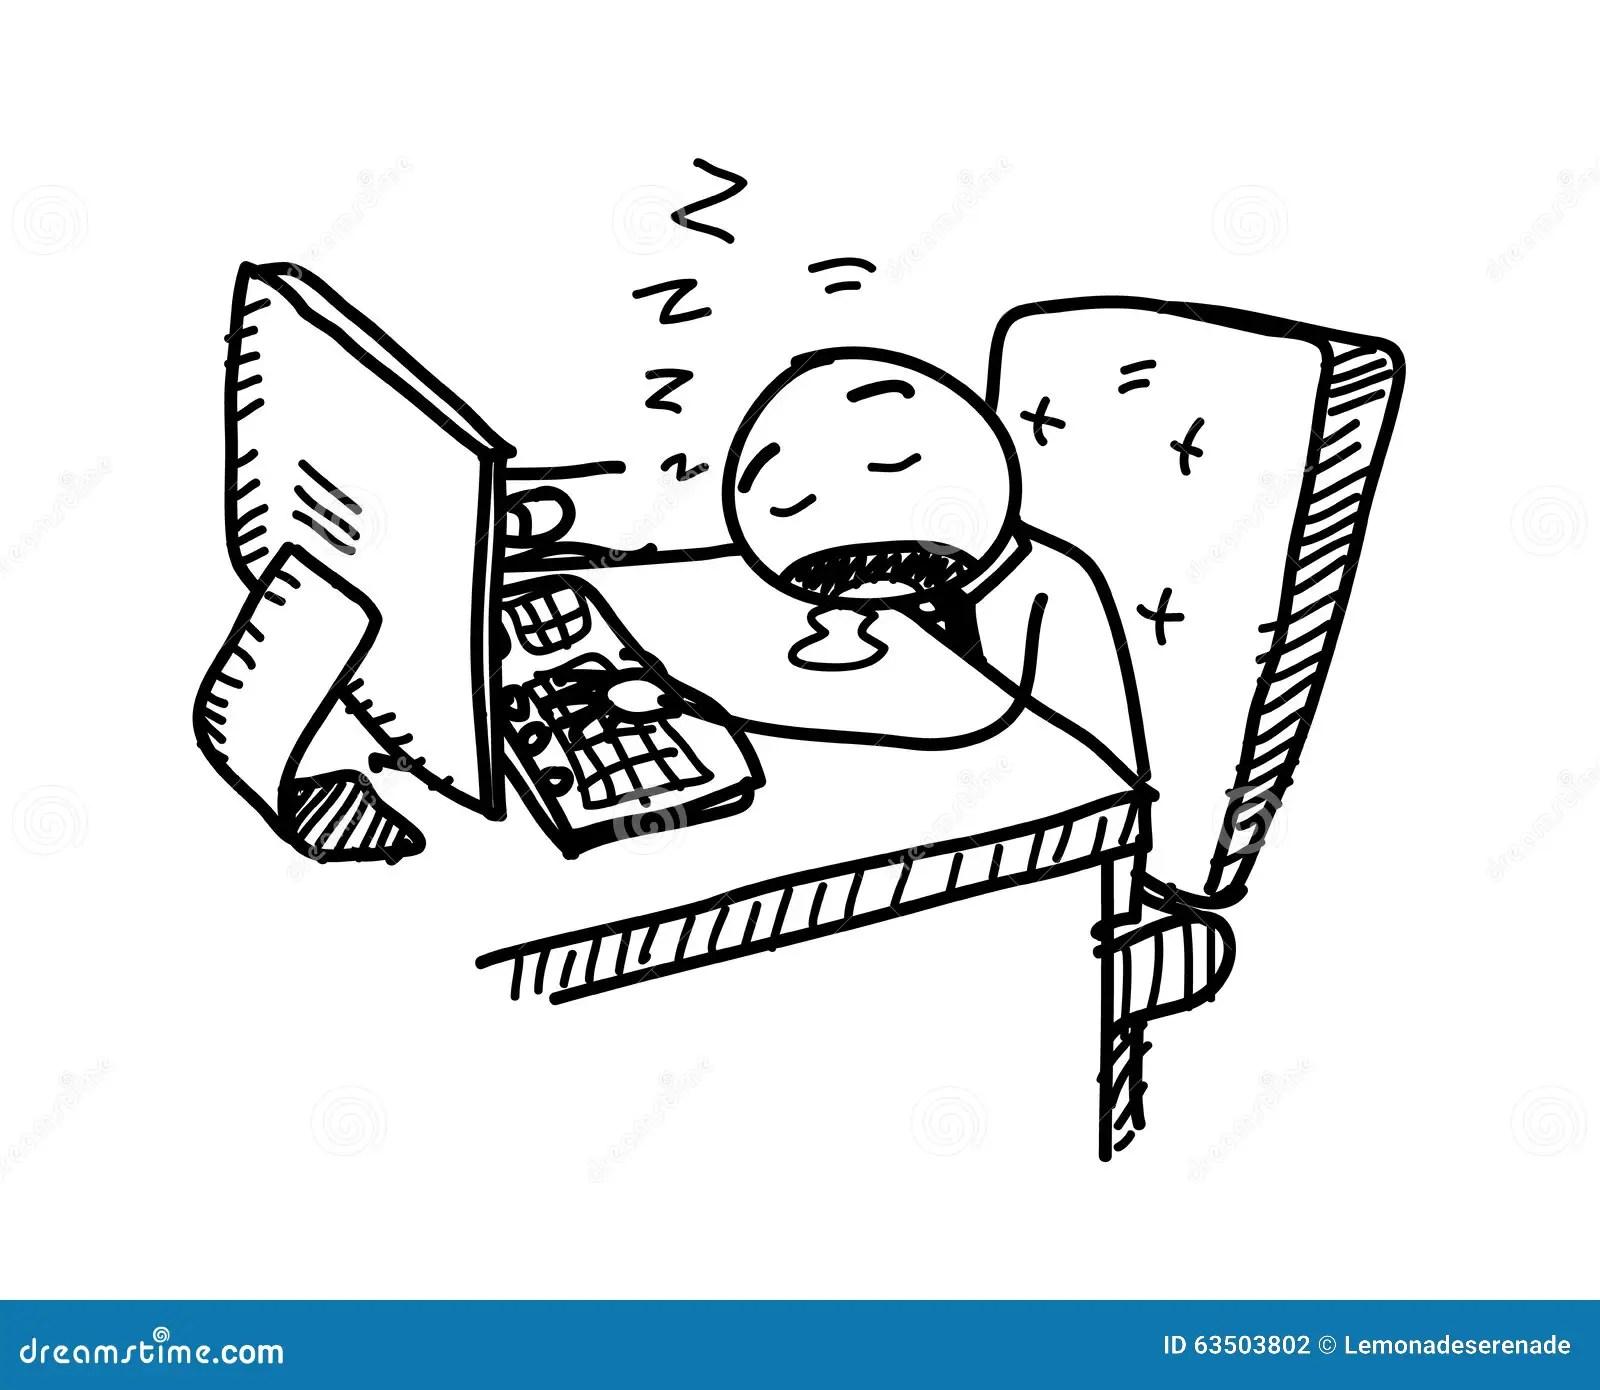 Sleeping At Work Stock Vector